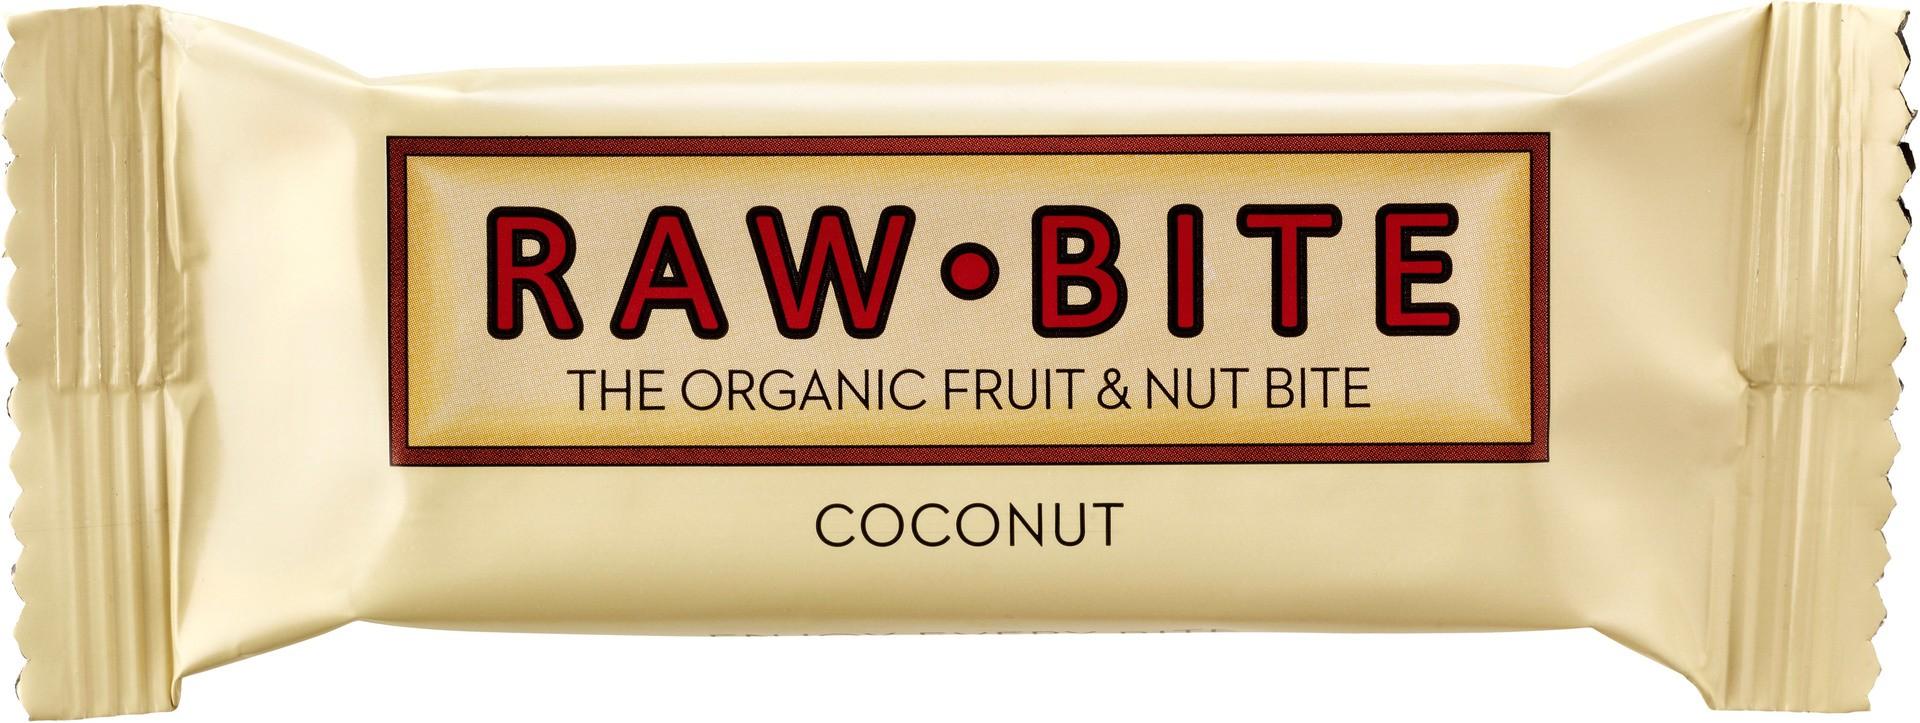 Biologische raw.bite Fruit & nut bite coconut 50 gr